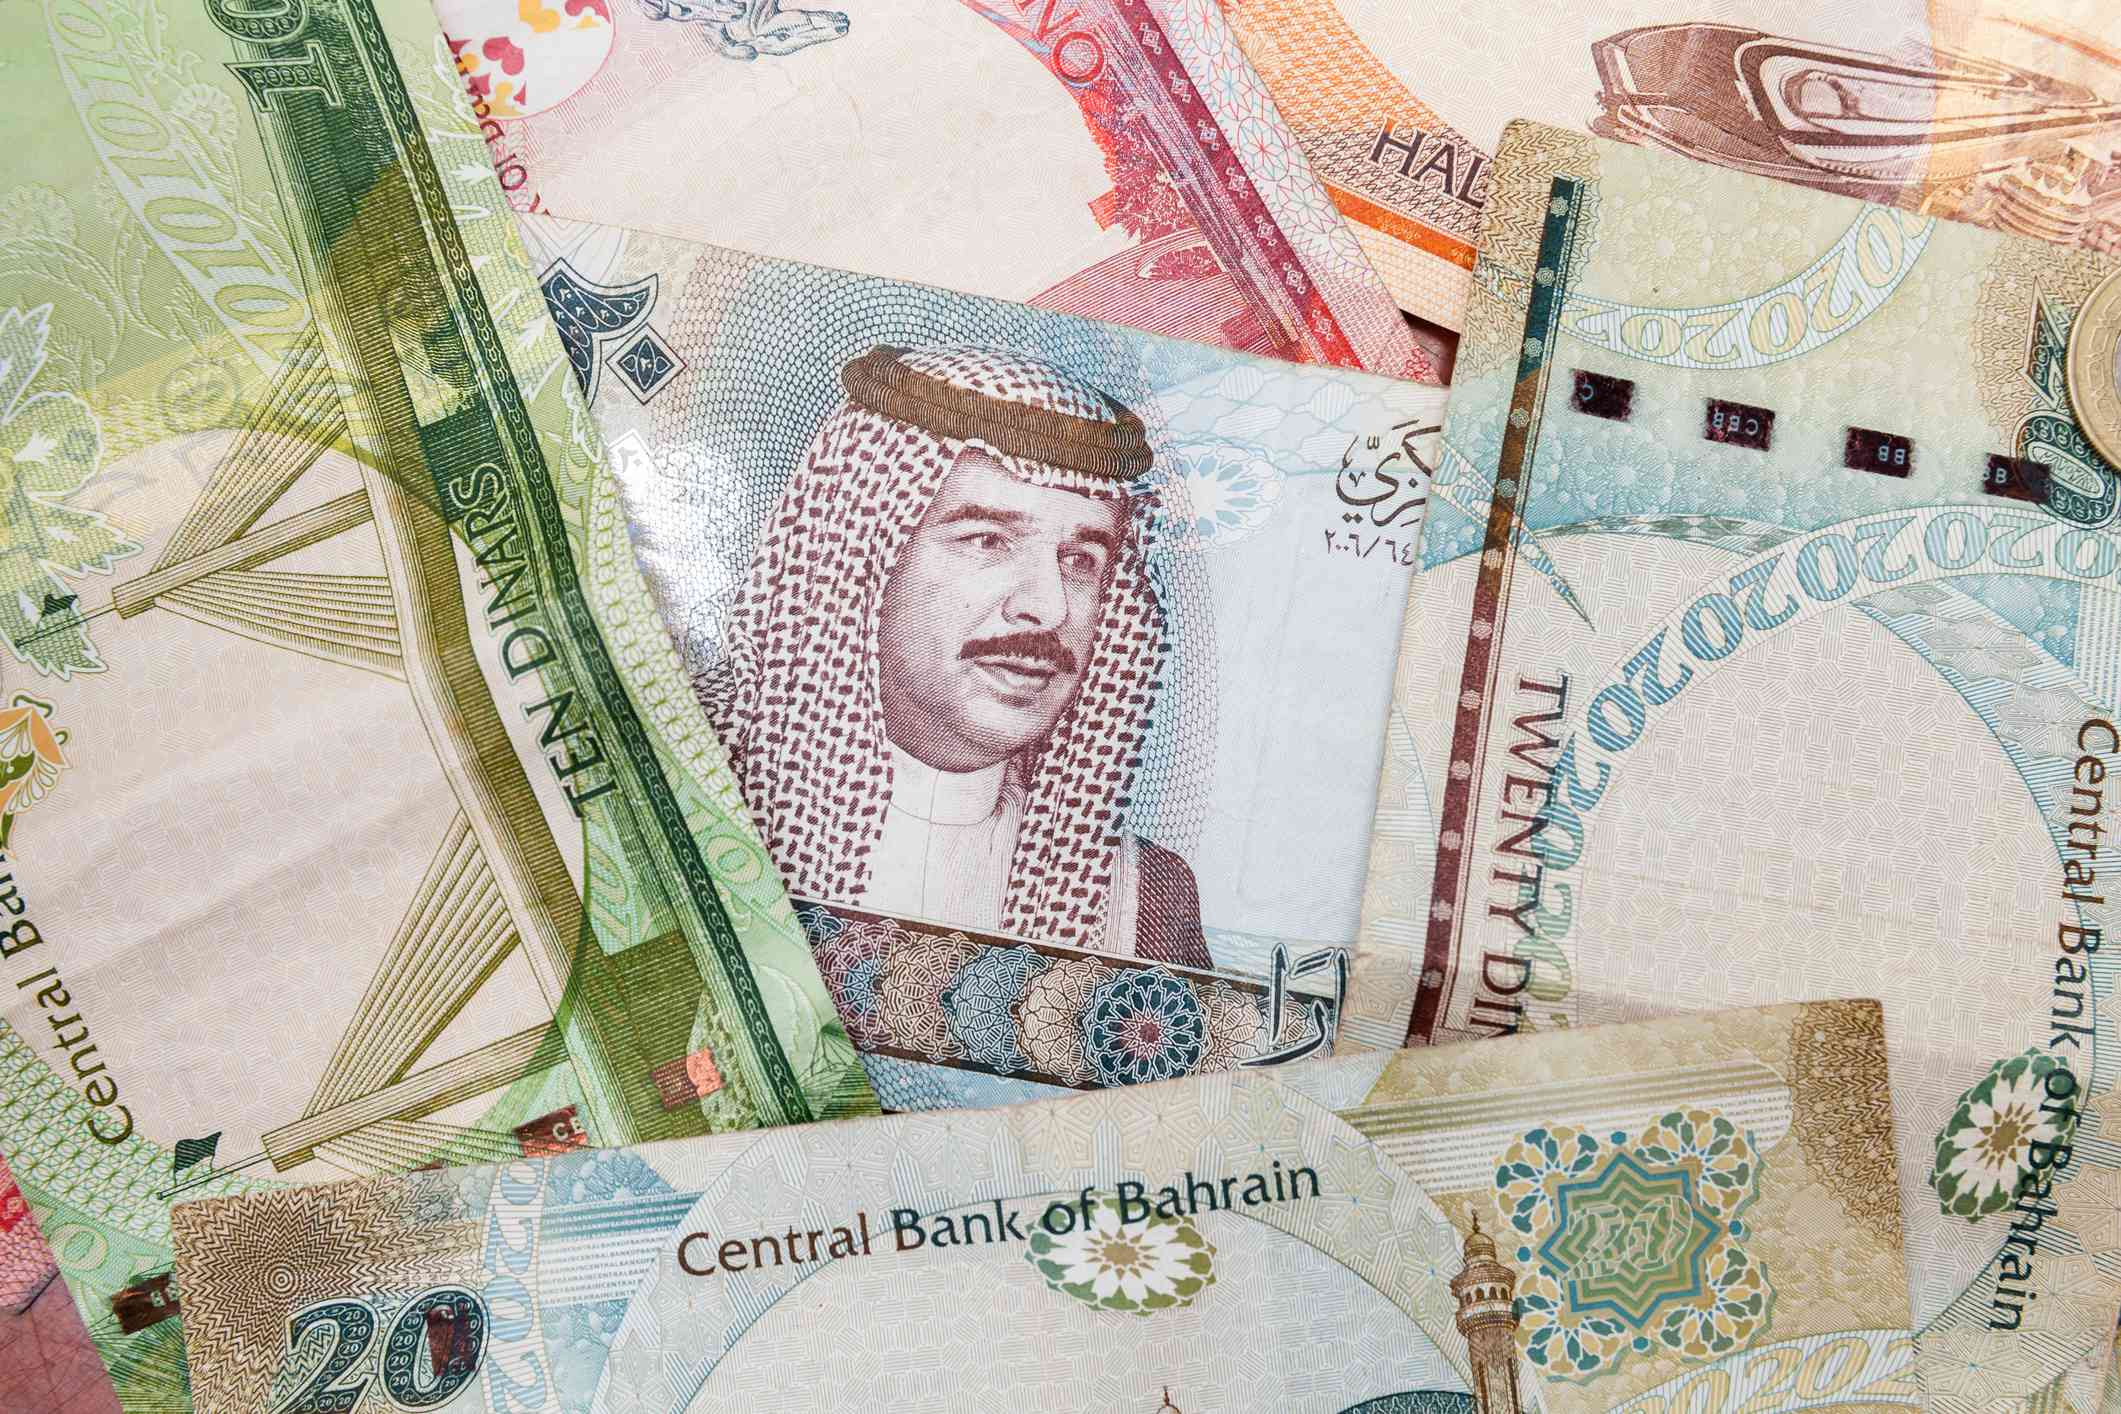 Bahrain banknotes